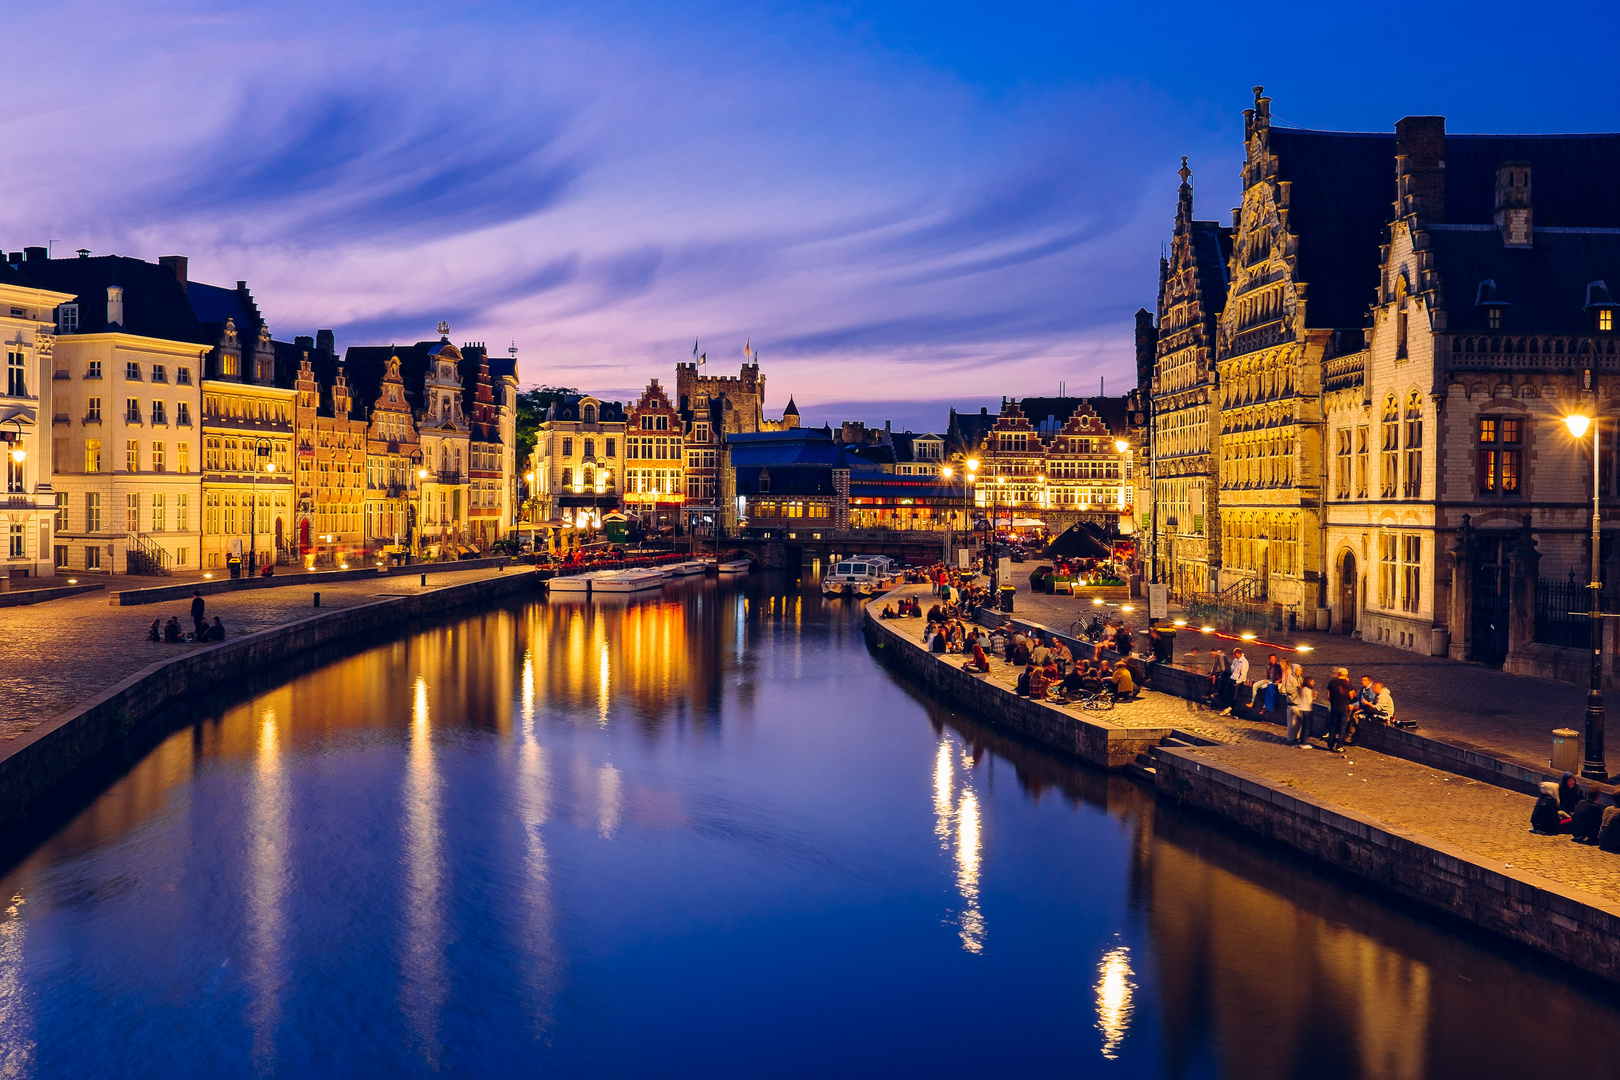 Gand by night (Belgio)